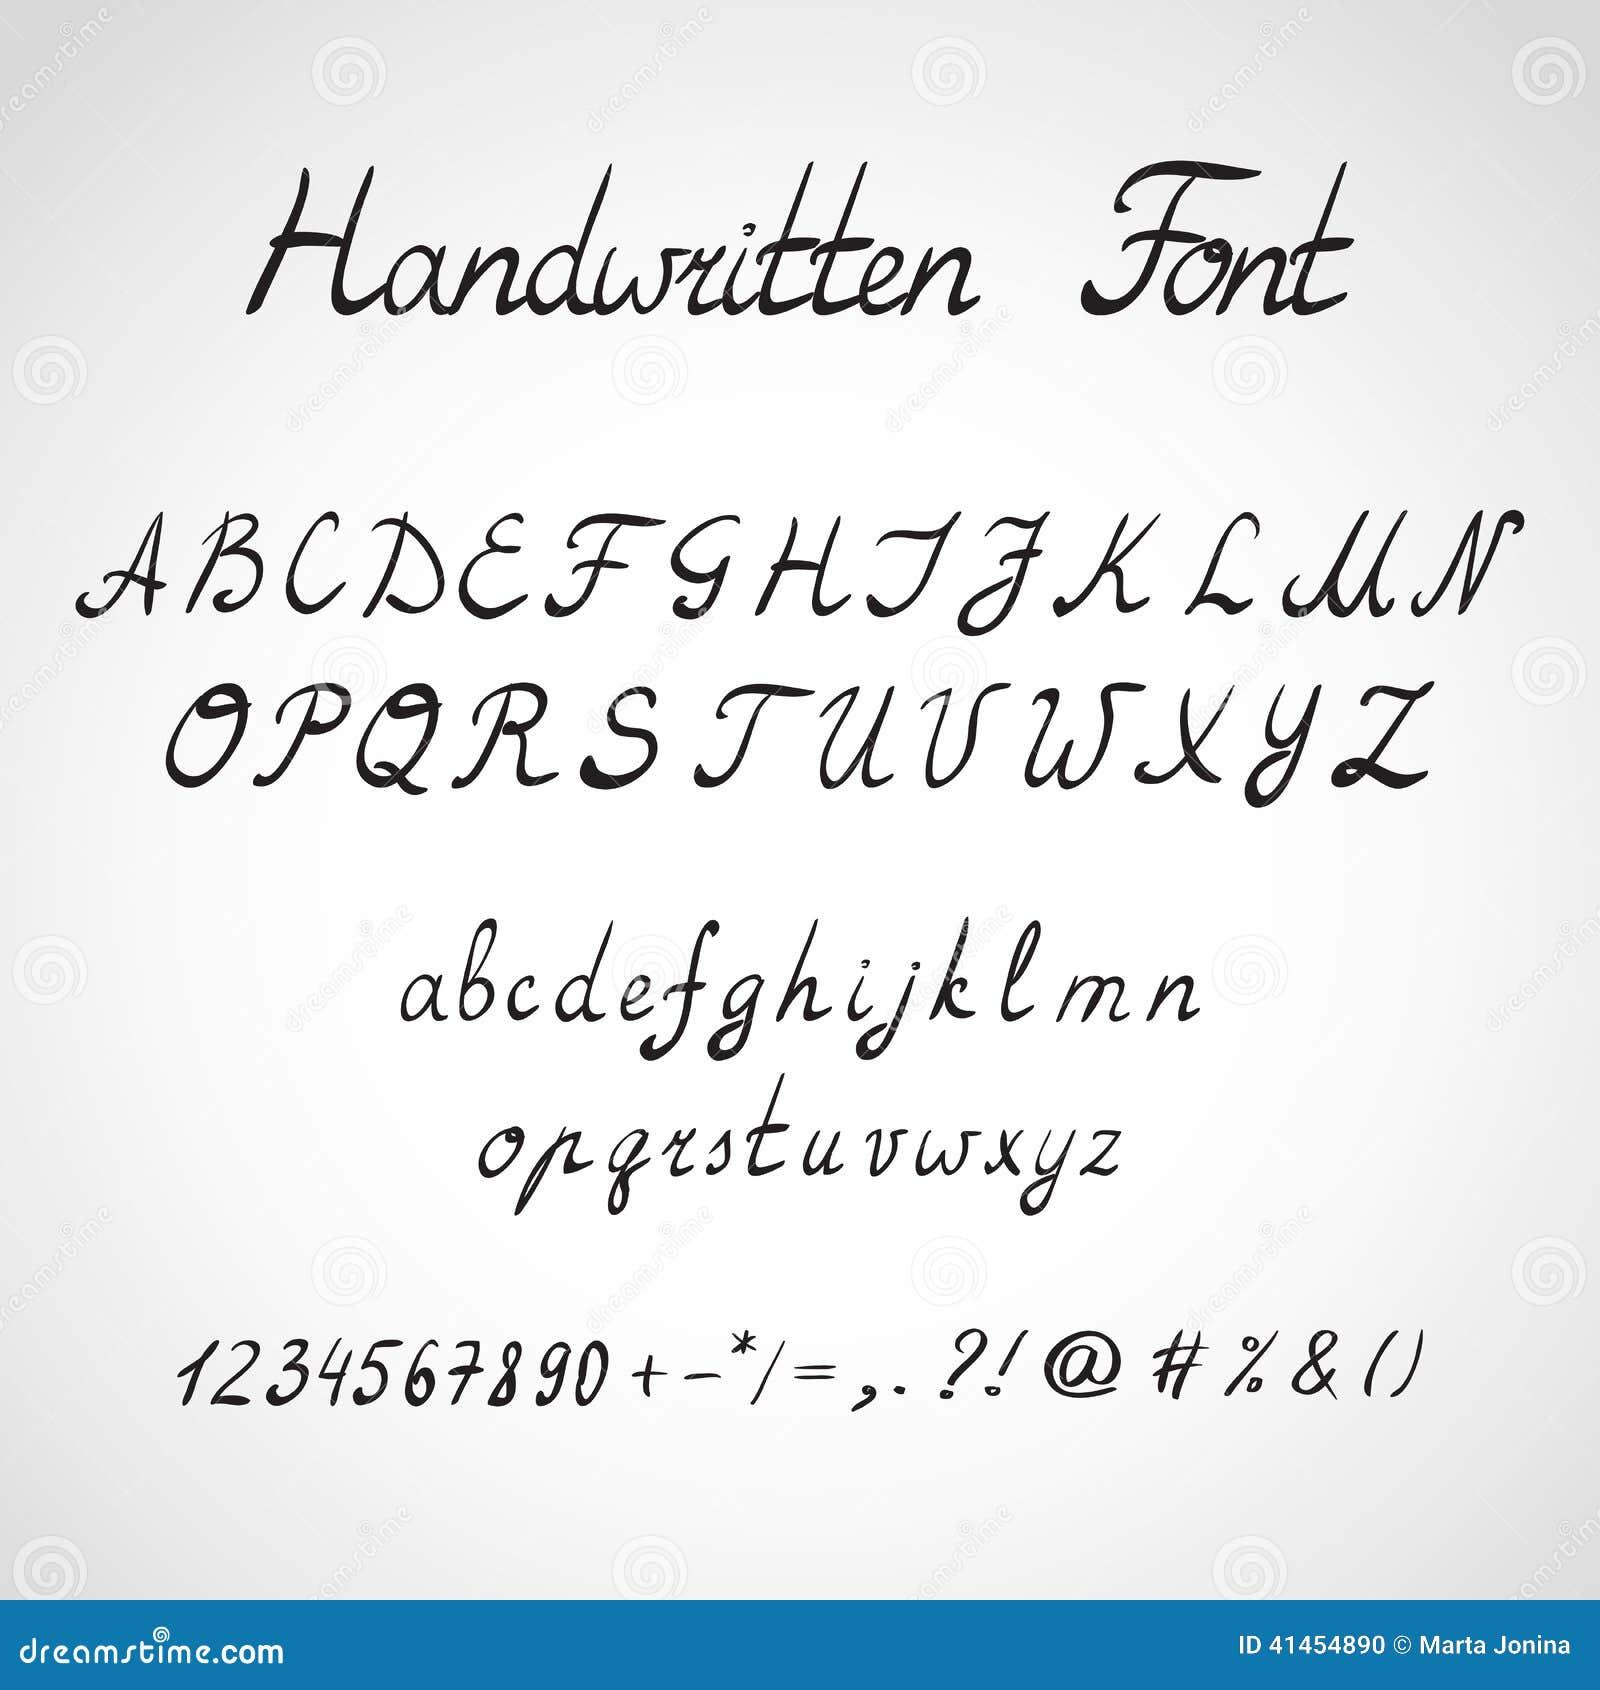 Handwritten Font Ink Style Stock Illustration Image